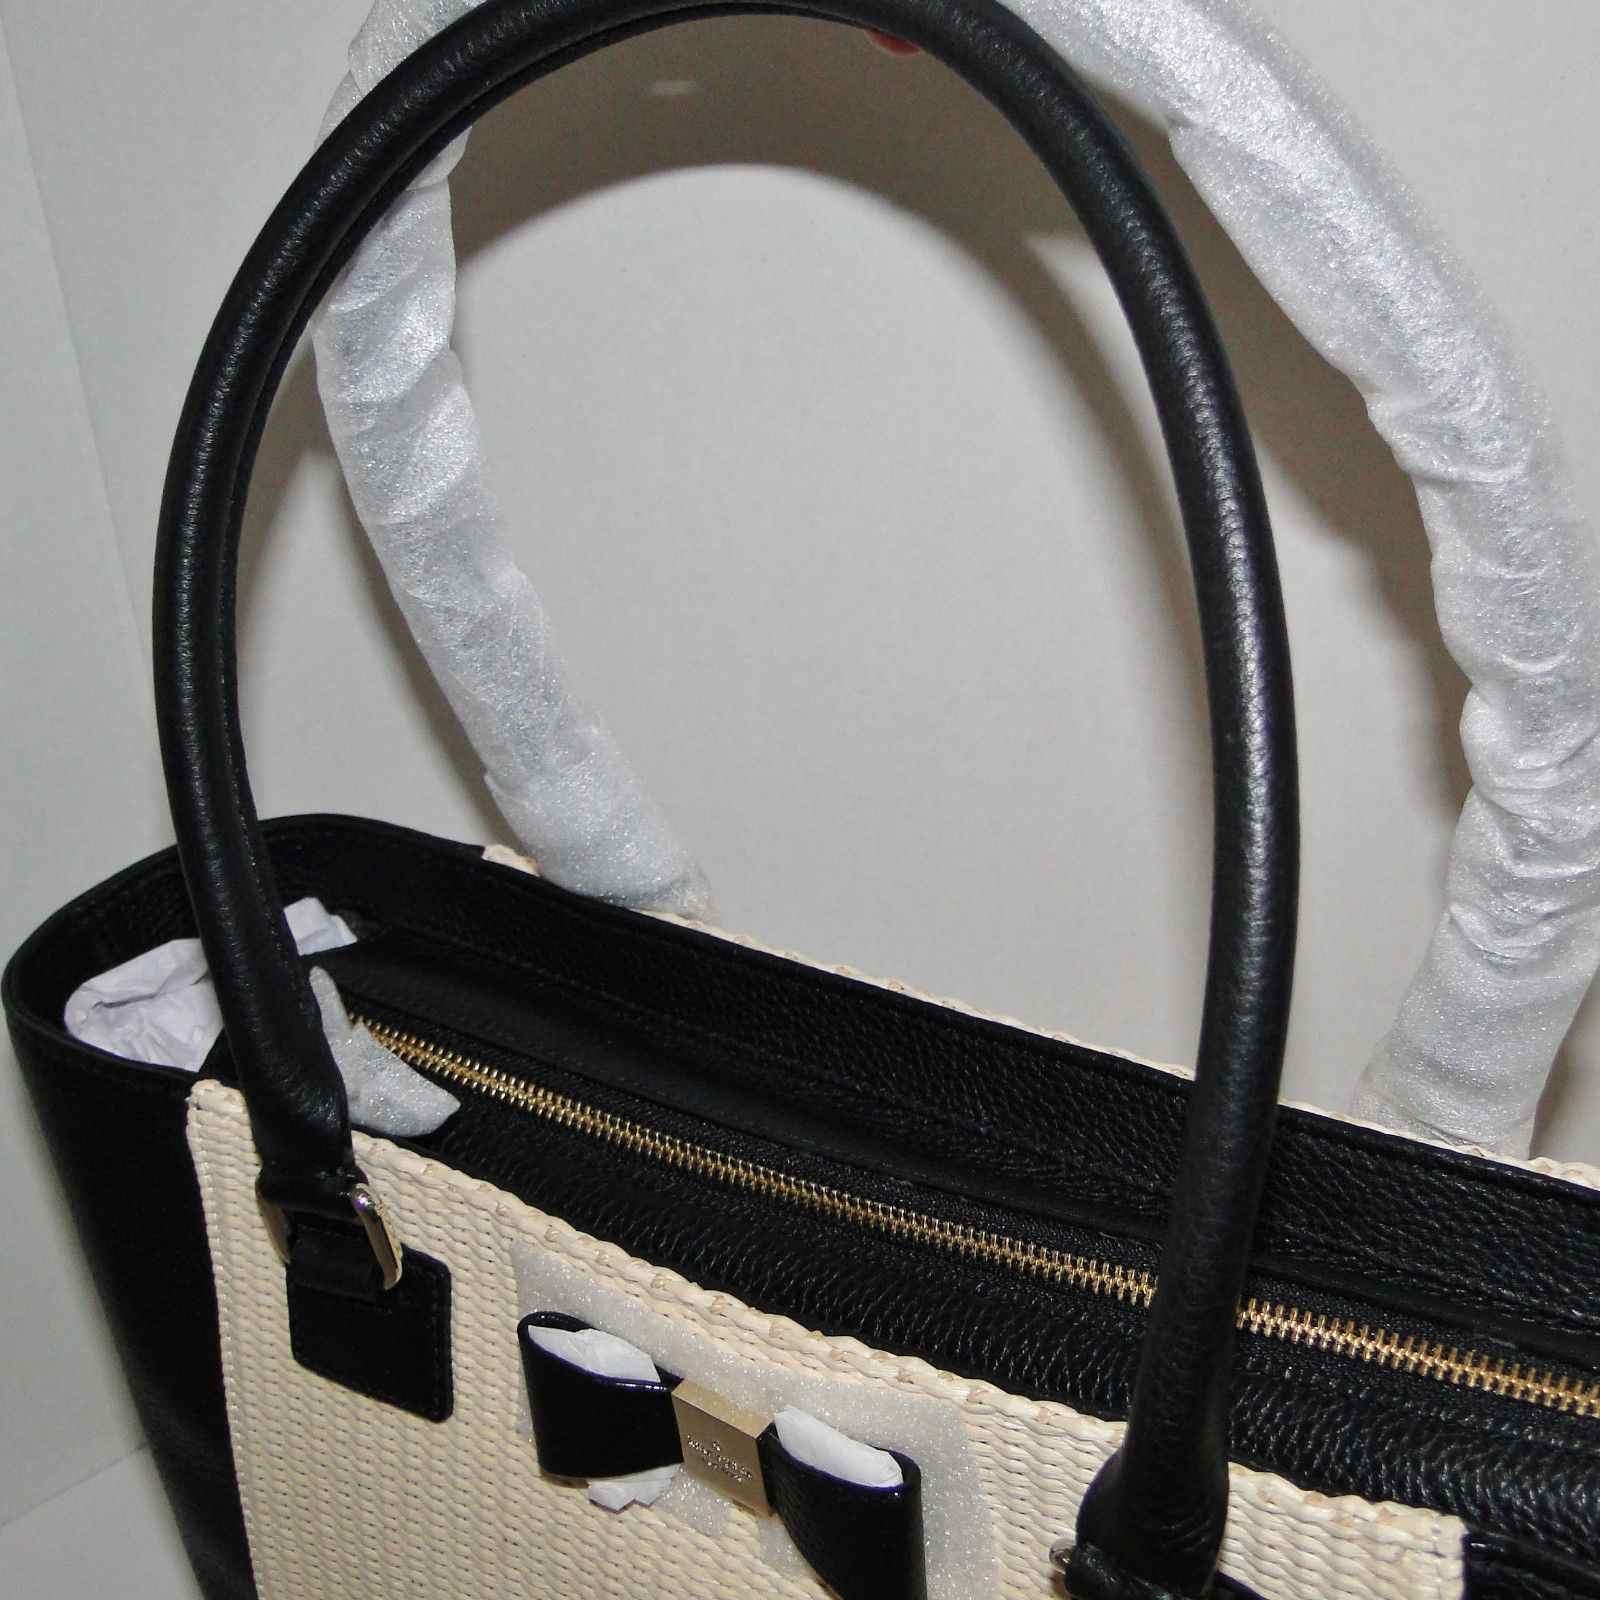 Kate Spade Francis Renny Drive Straw Tote Shopper Brand New